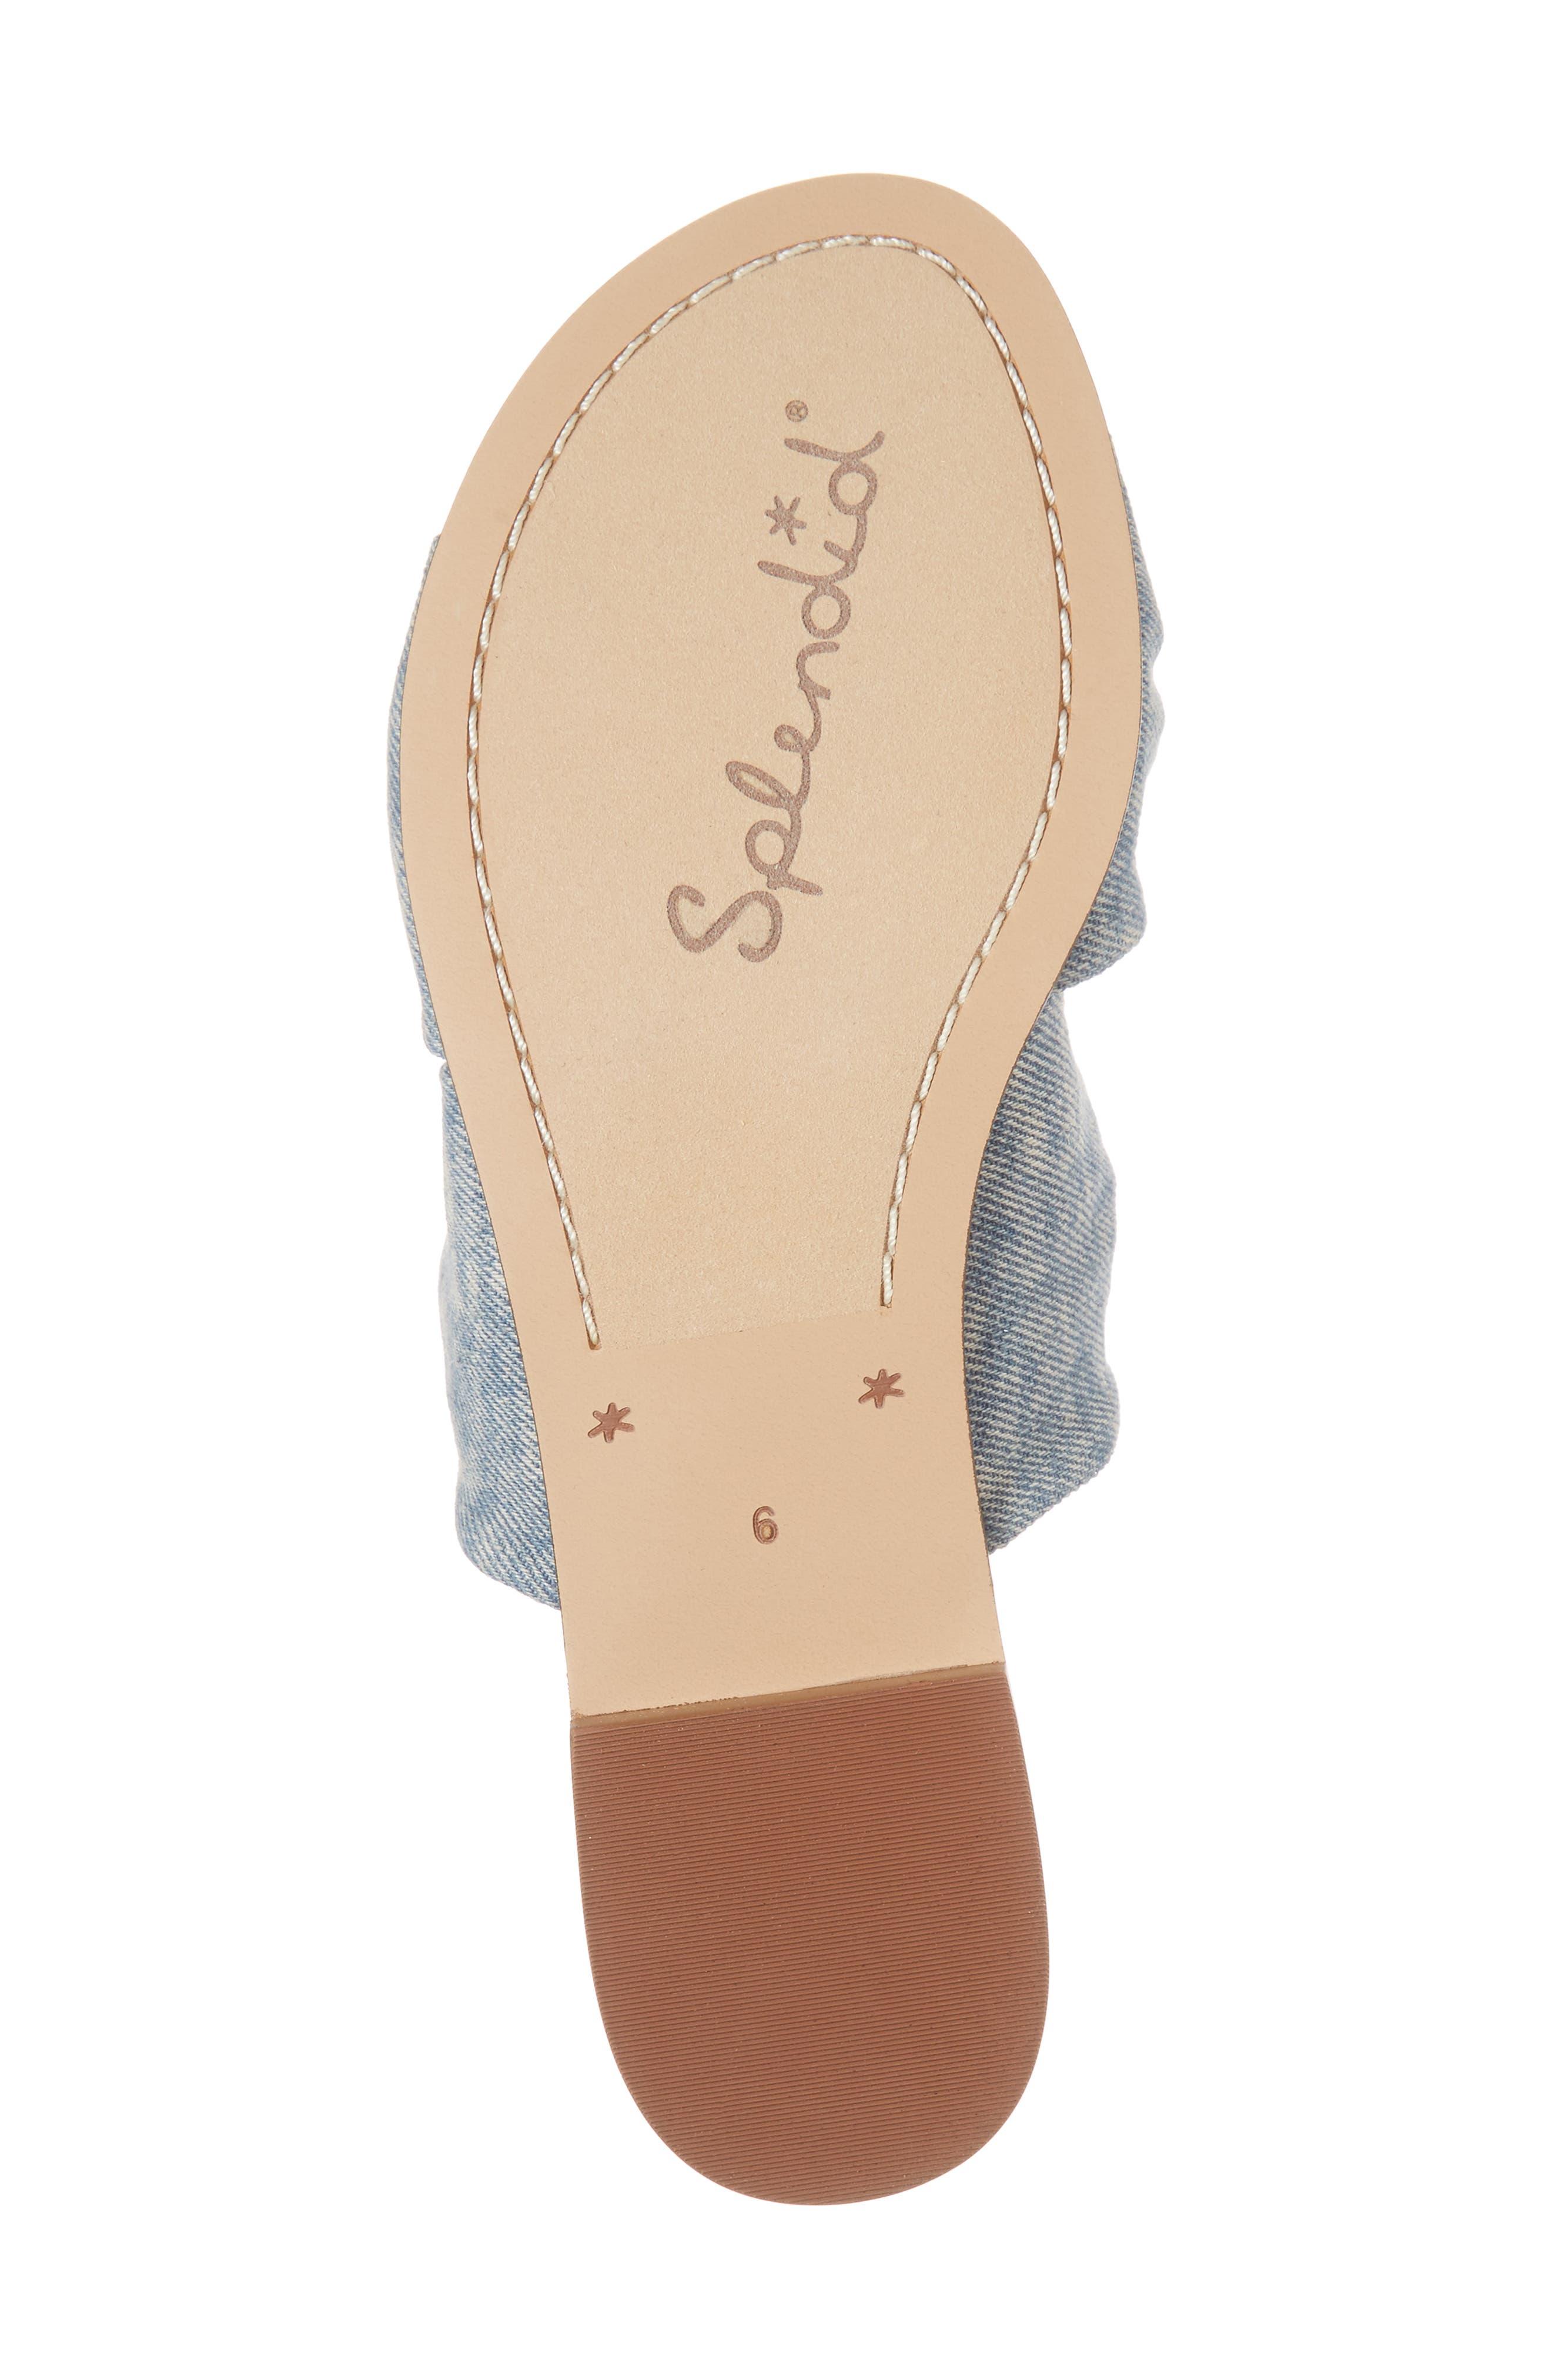 Barton Double Knotted Slide Sandal,                             Alternate thumbnail 6, color,                             Jean Fabric